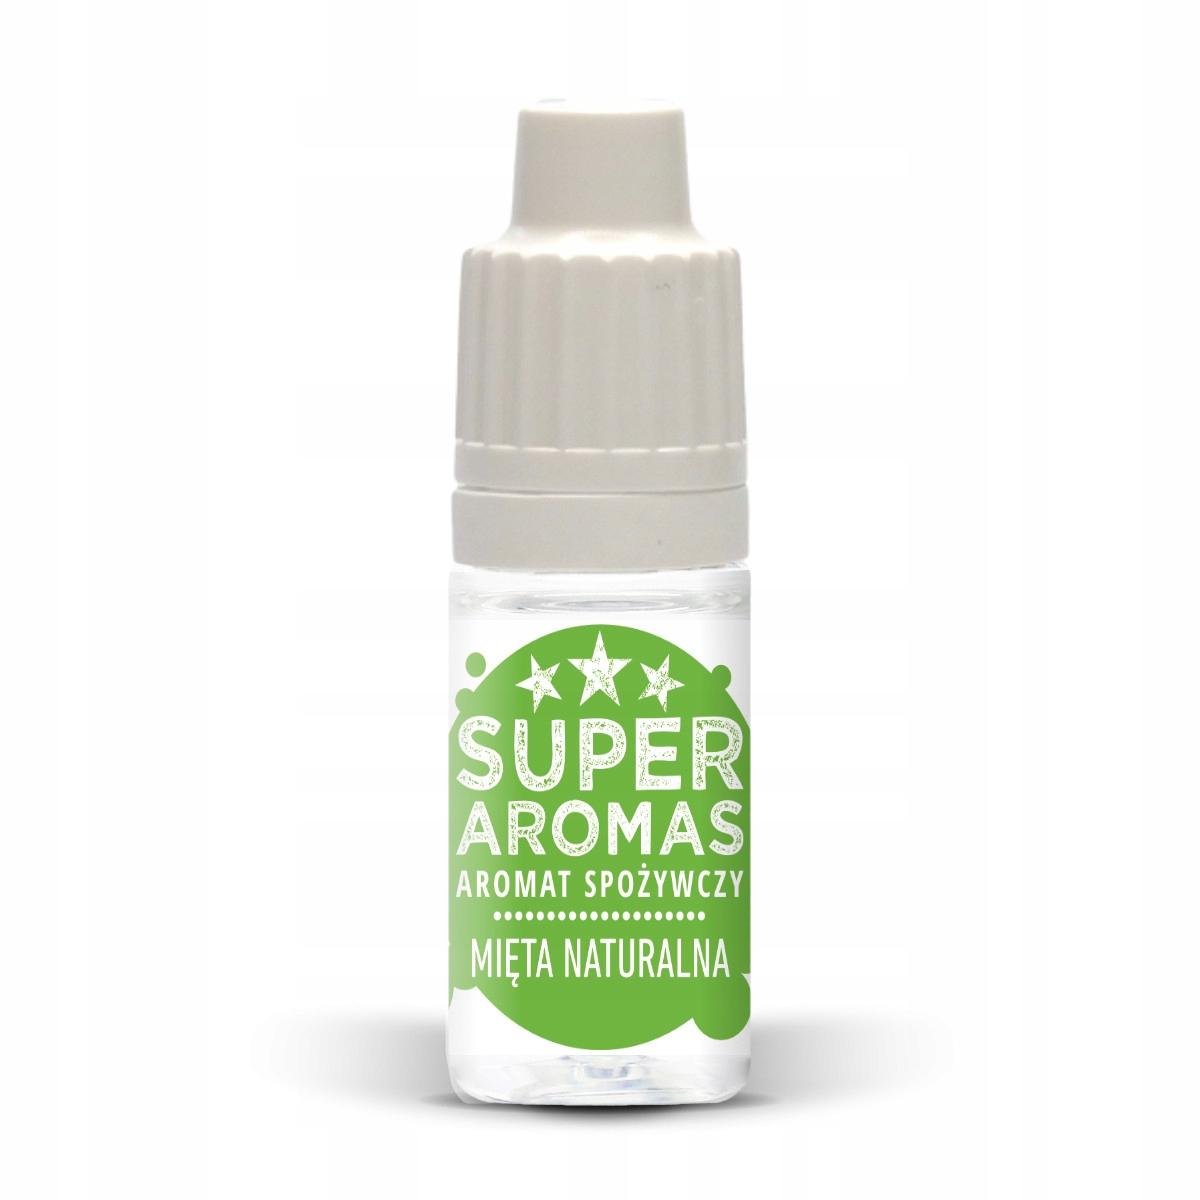 SUPER AROMAS Aromat spożywczy MIĘTA NATURALNA 10